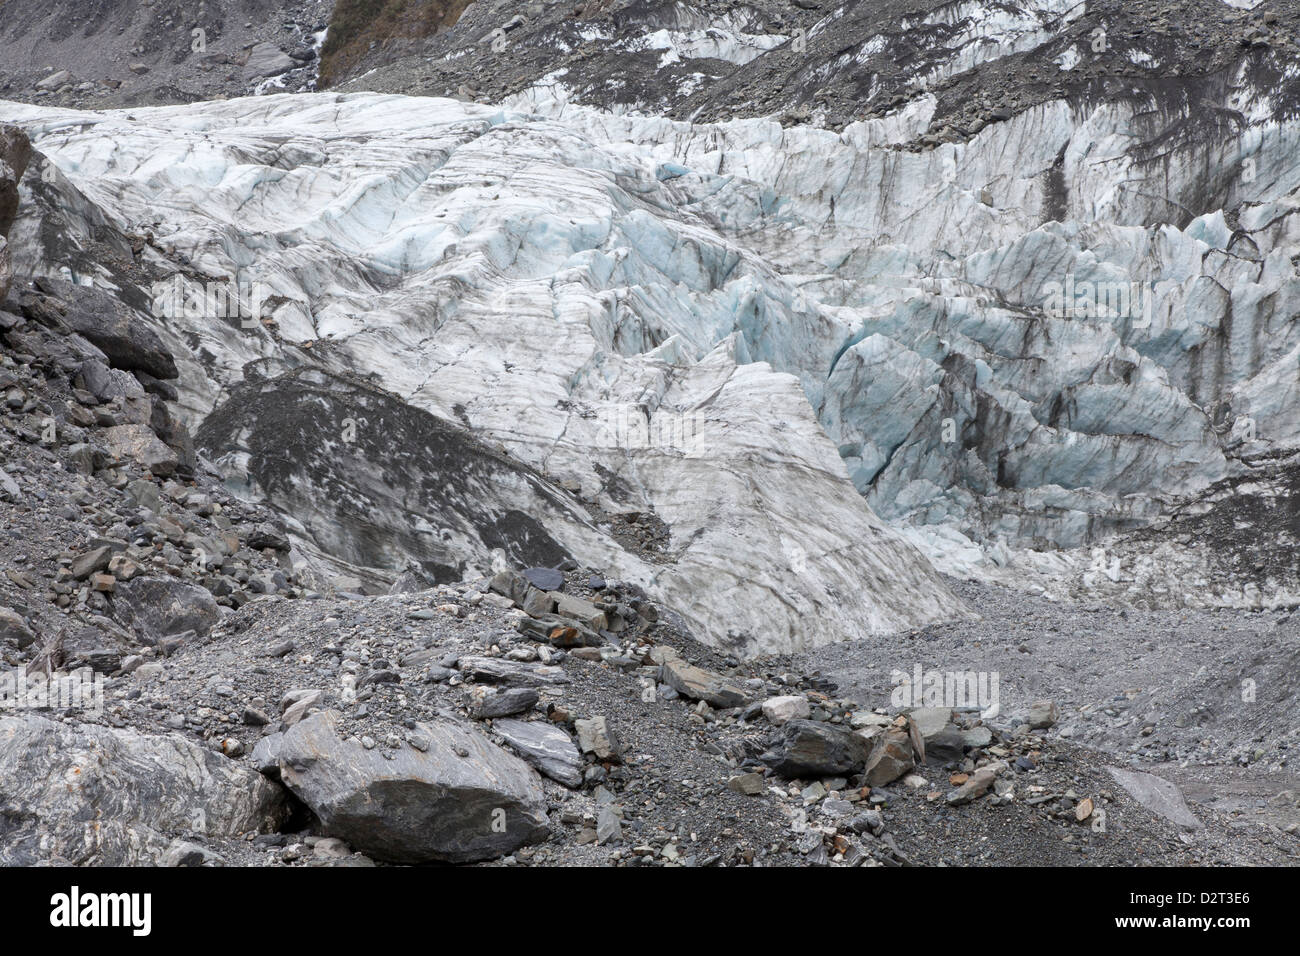 Fox Glacier, Southern Island, New Zealand - Stock Image